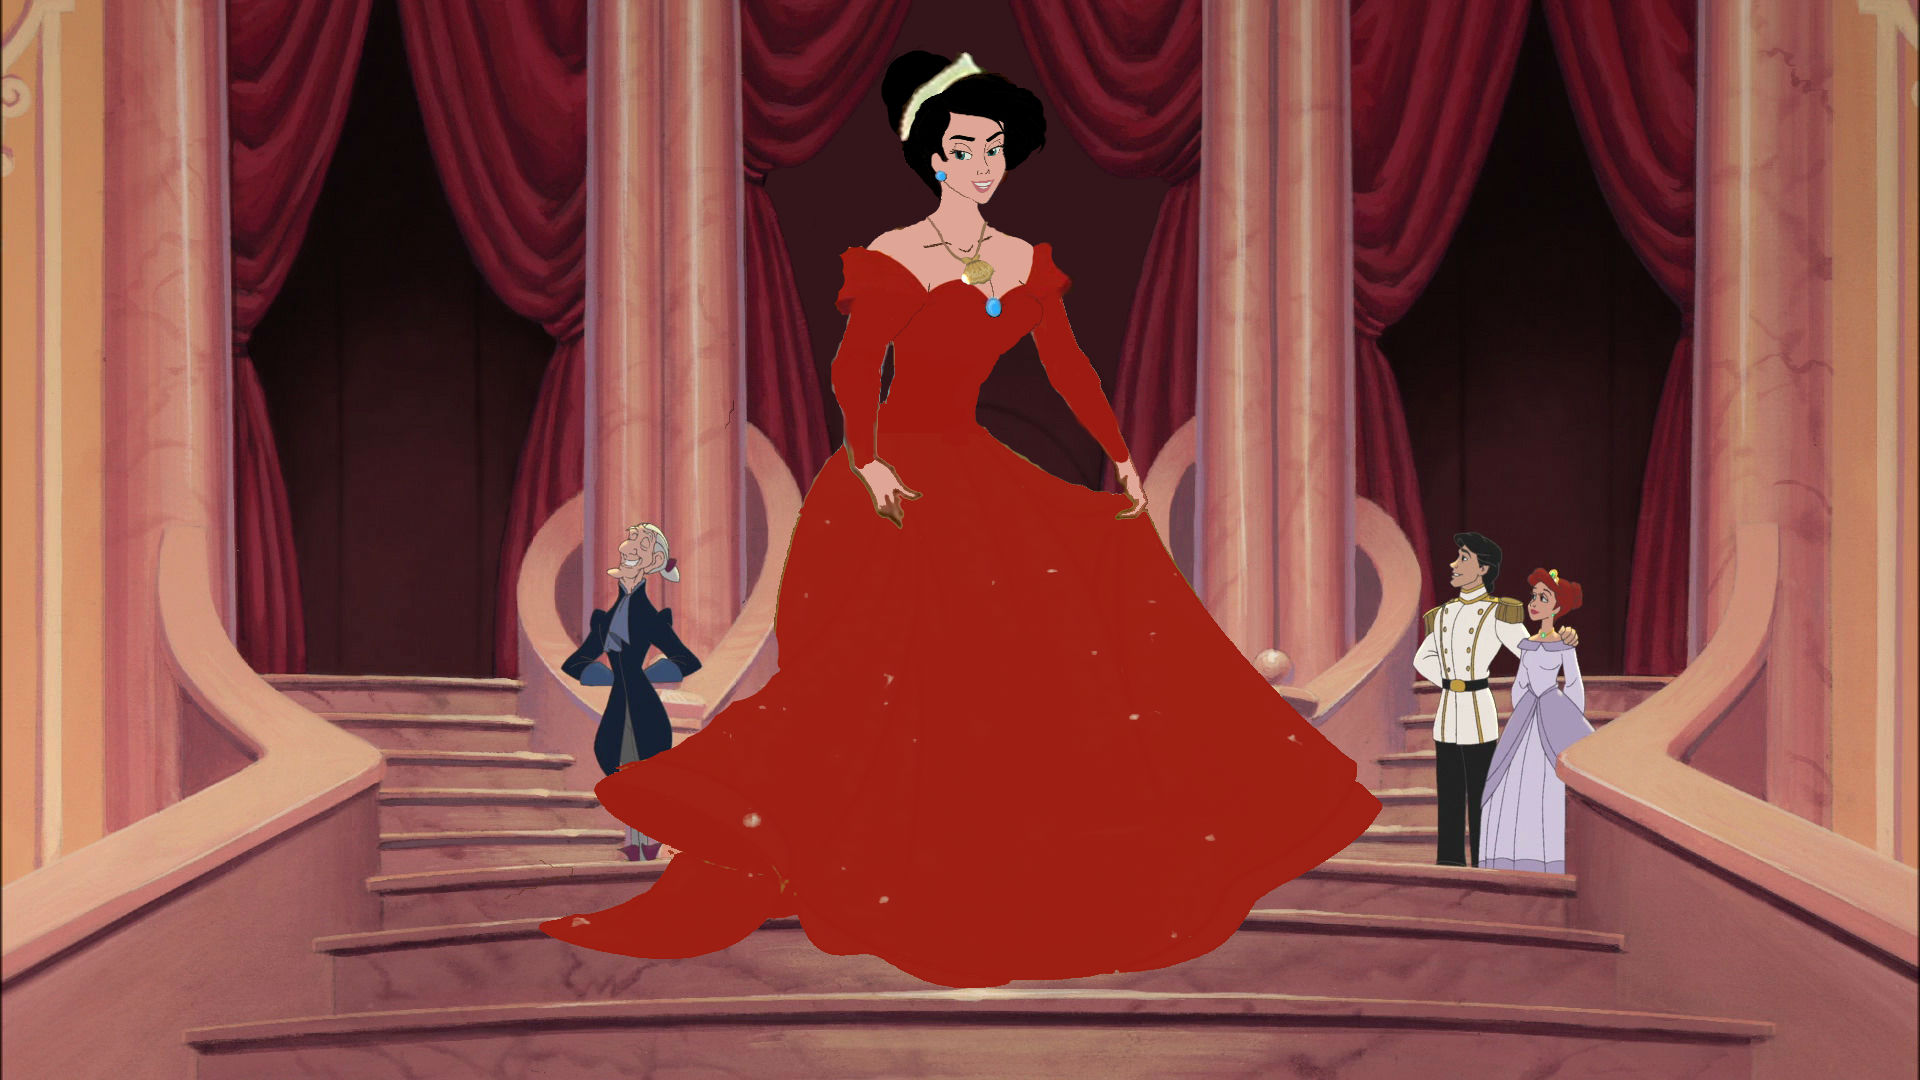 Walt Disney Fan Art - Grown Up Princess Melody